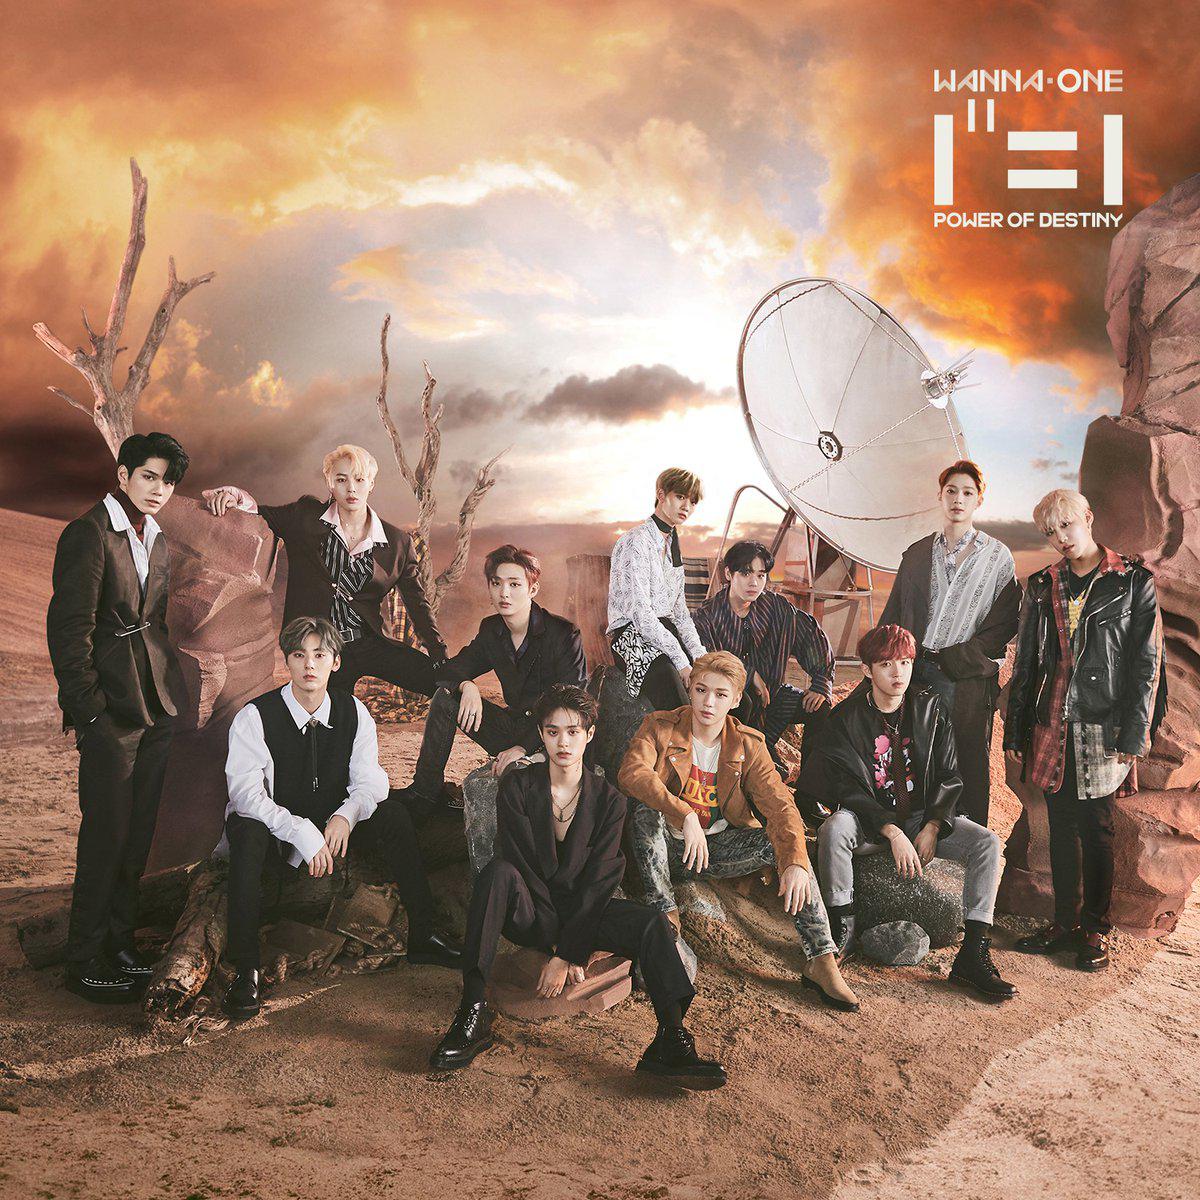 Promotional photo for 1¹¹\u003d1 (Power Of Destiny).